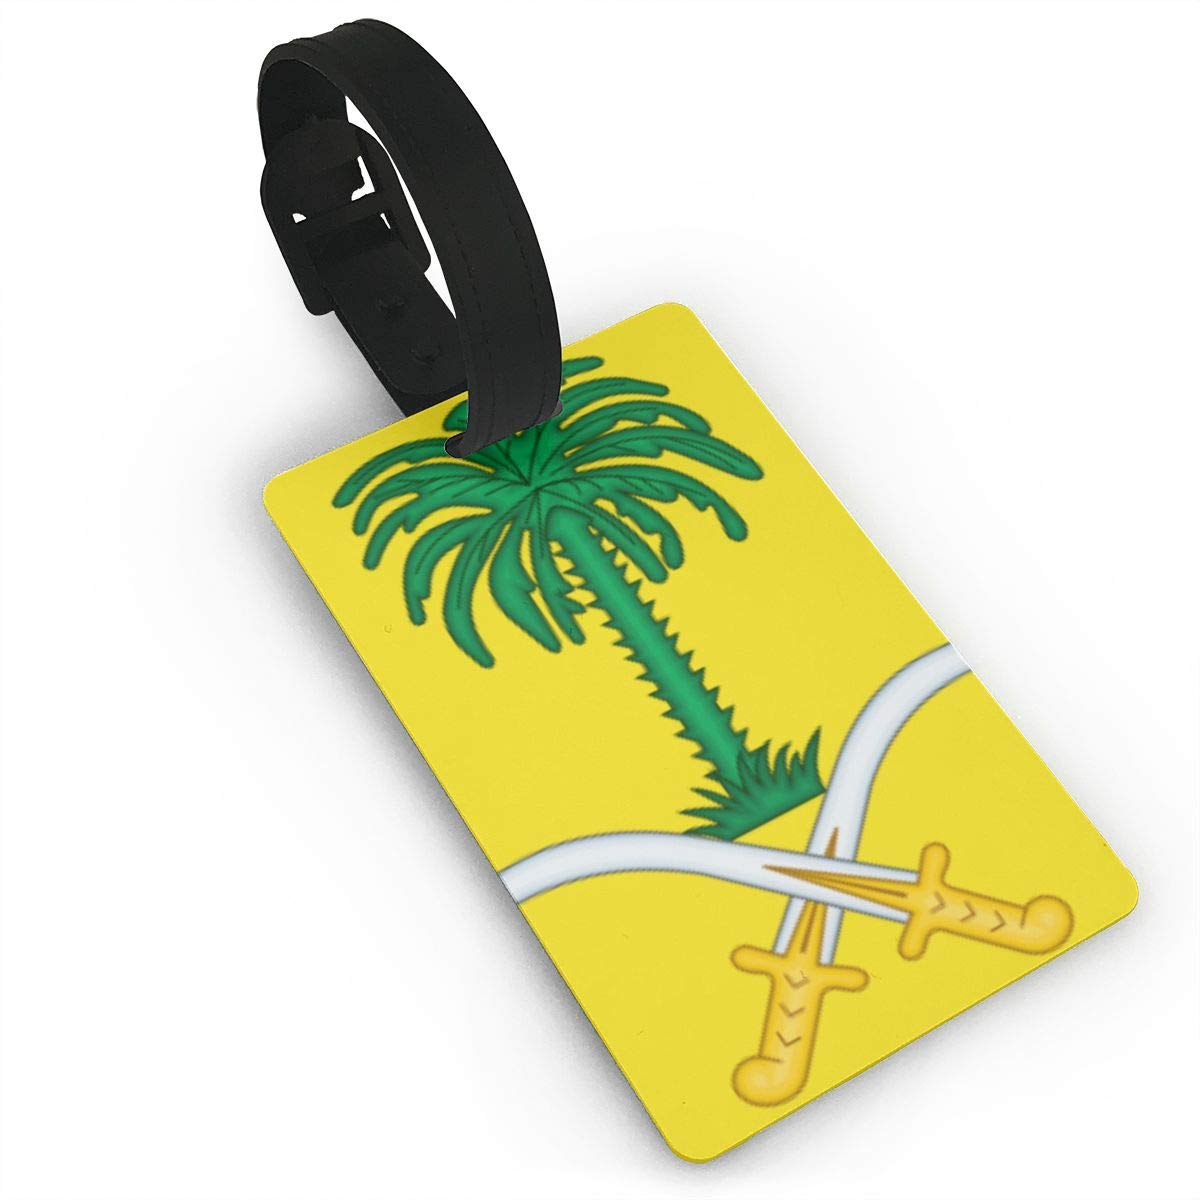 KODW12 Coat of Arms of Saudi Arabia Luggage Tag Travel Bag Labels Suitcase Bag Tag Name Address Cards